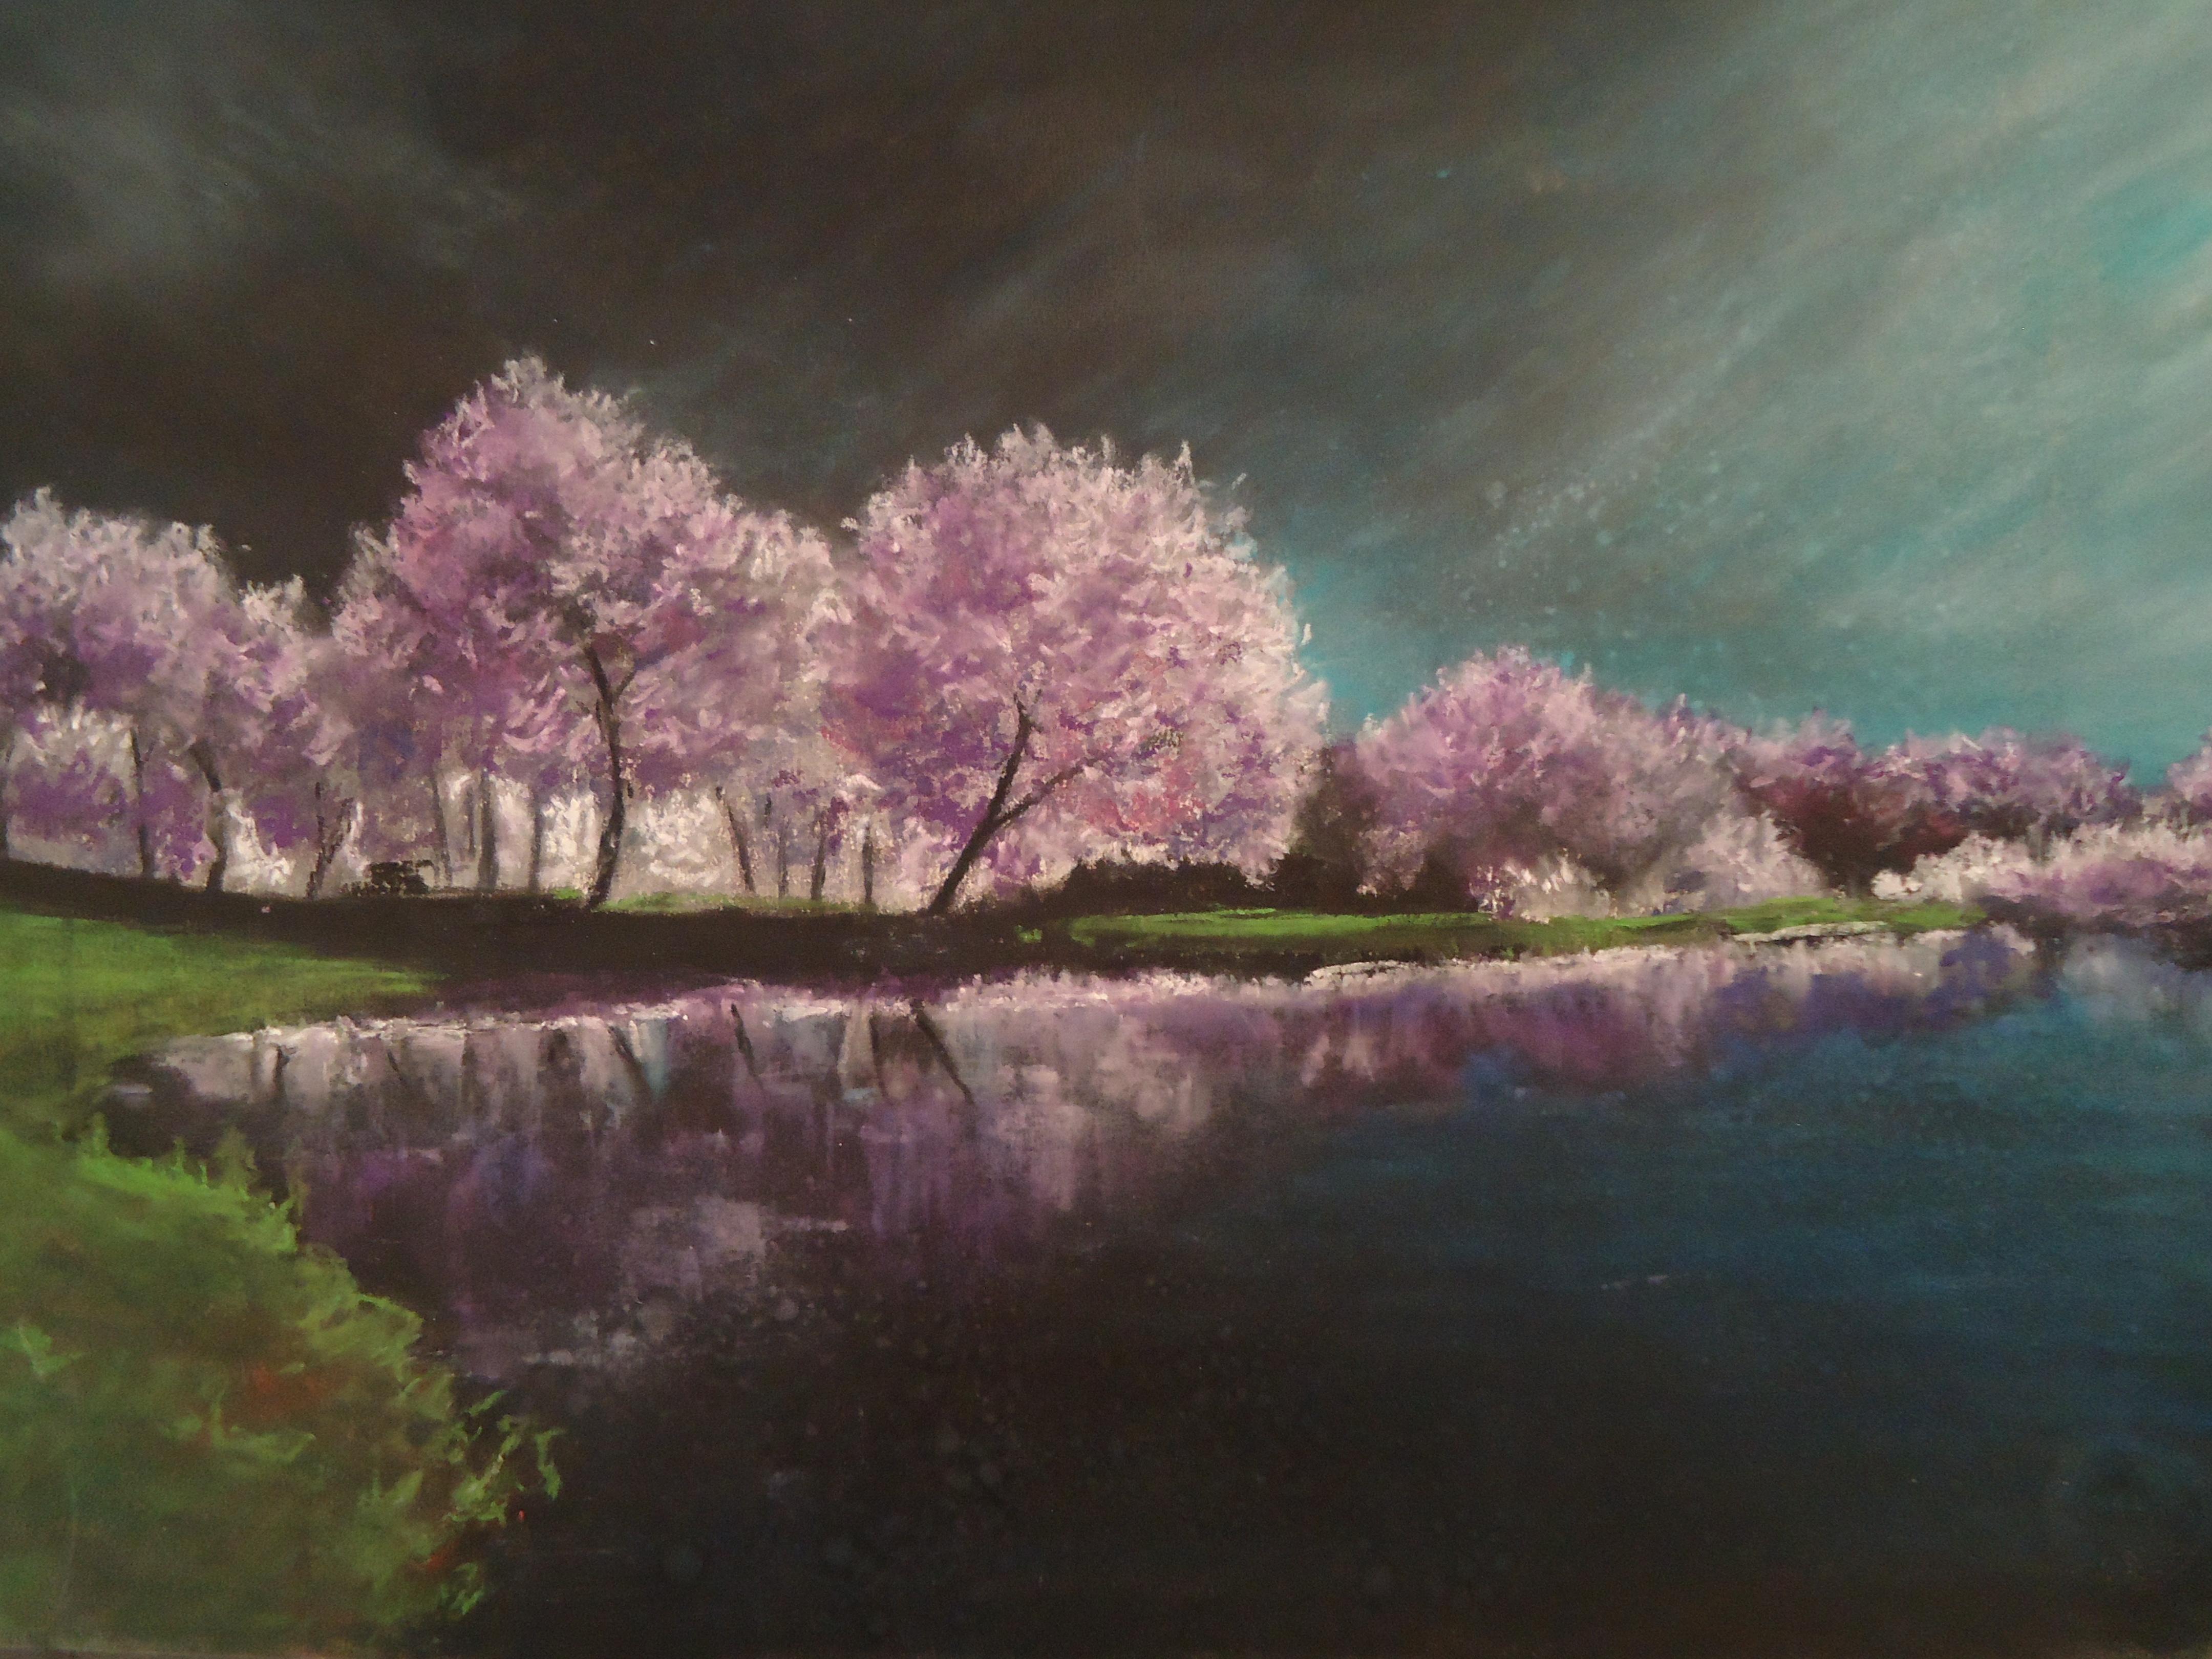 soft pastel landscape by blackblacksea on DeviantArt